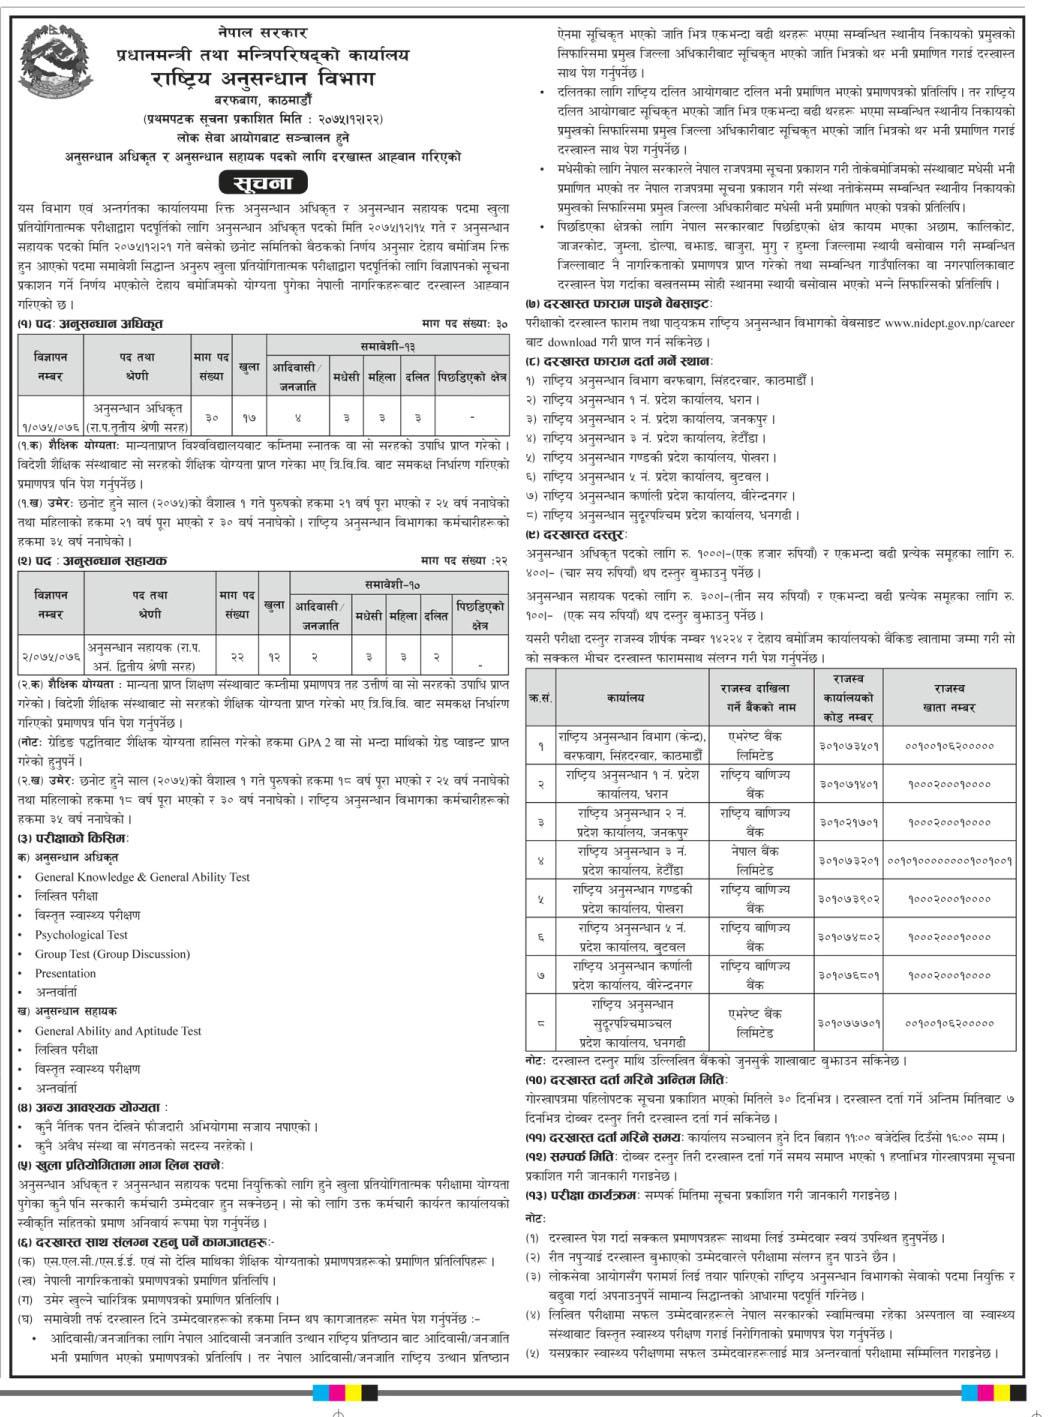 राष्ट्रिय अनुसन्धान विभाग,  राष्ट्रिय अनुसन्धान विभाग जागिर,  राष्ट्रिय, अनुसन्धान, विभाग, Rastriya job vacancy,  Rastriya anusandhan bibhag job vacancy,  Rastriya anusandhan job vacancy,  anusandhan job vacancy,  Rastriya job vacancy 2075,  Rastriya anusandhan bibhag job vacancy 2075,  Rastriya anusandhan job vacancy 2075,   anusandhan job vacancy 2075,  Rastriya anusandhan bibhag, Rastriya anusandhan, Rastriya anusandhan bibhag 2075, Rastriya anusandhan bibhag notice,  Rastriya anusandhan exam,  Rastriya anusandhan exam syllabus,